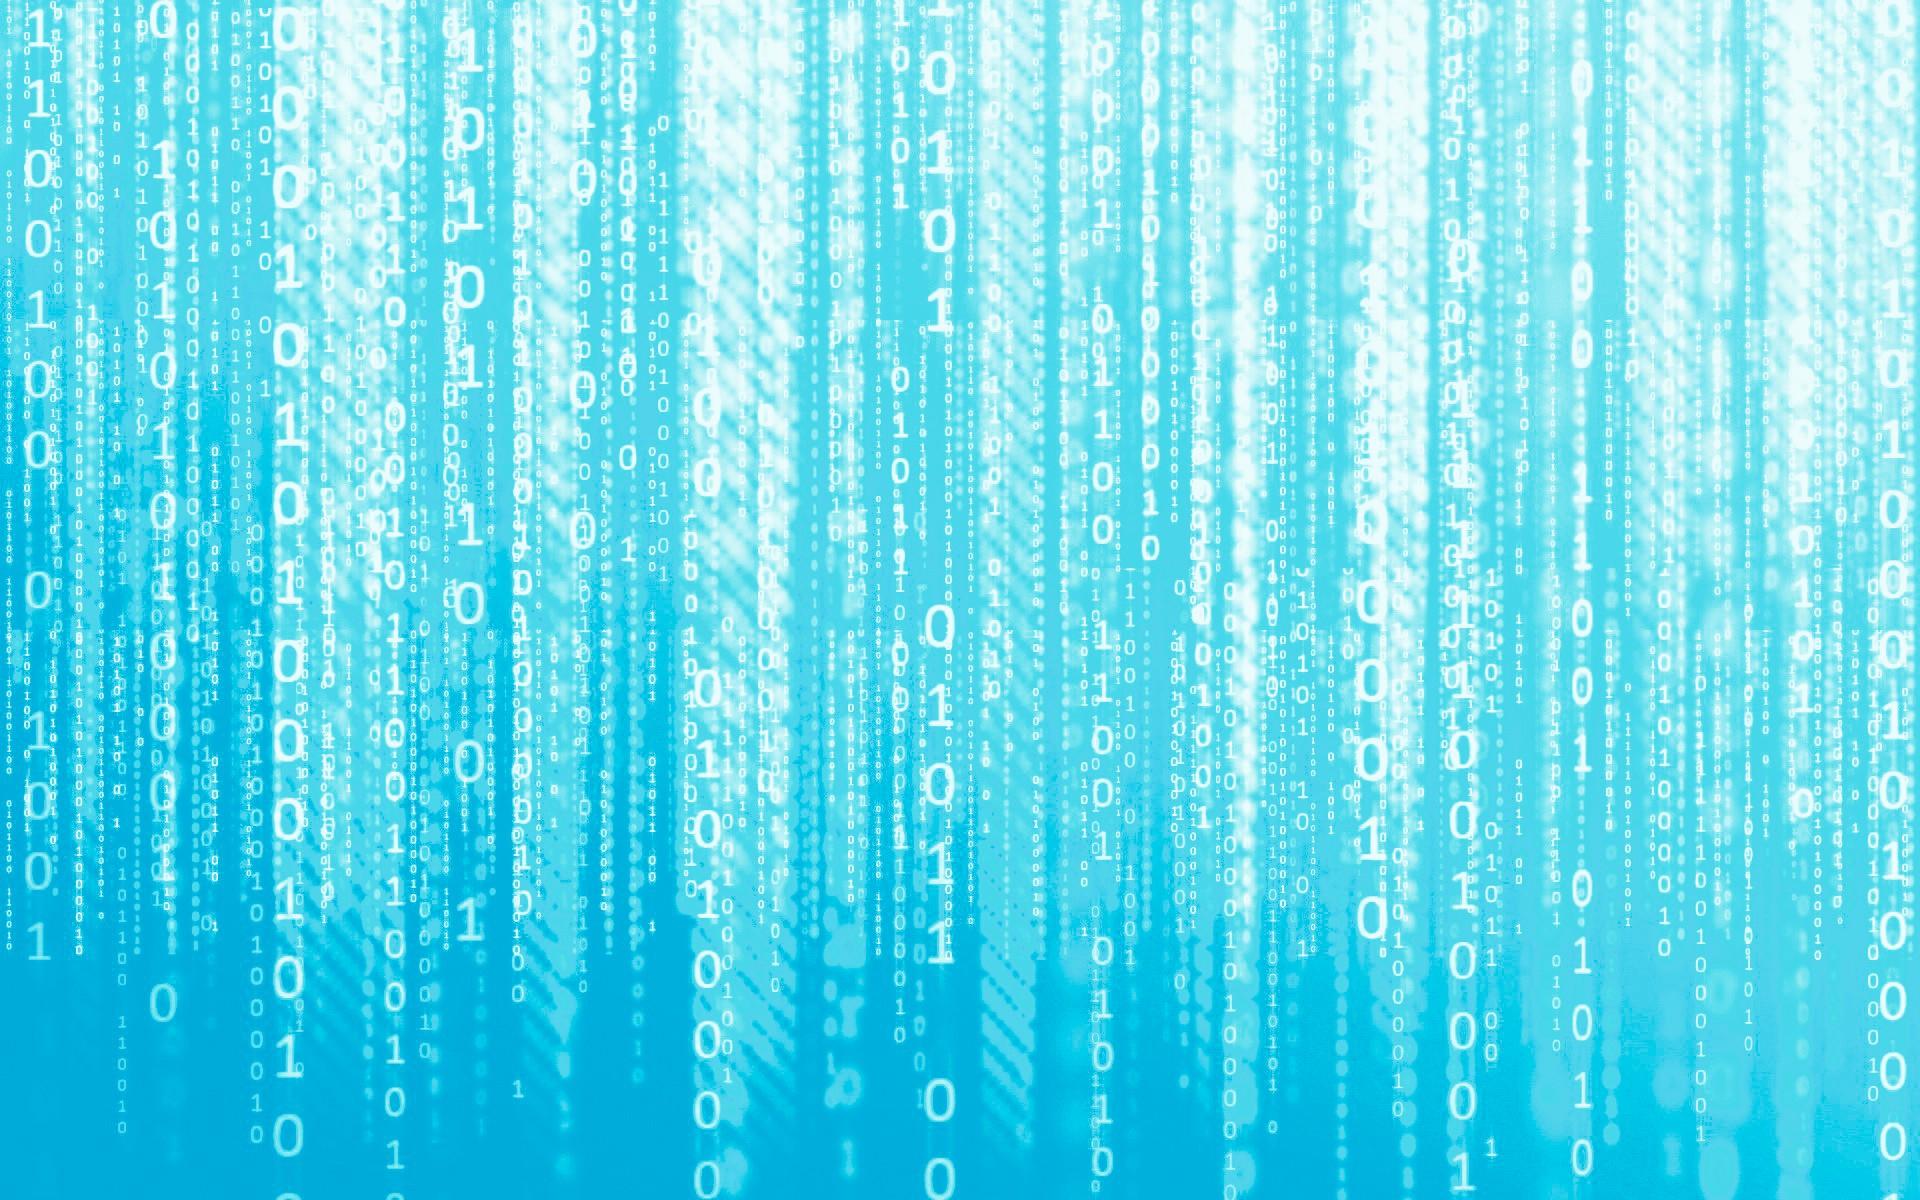 Binary Code Wallpaper Hd Coding Background 183 ① Download Free Stunning Full Hd